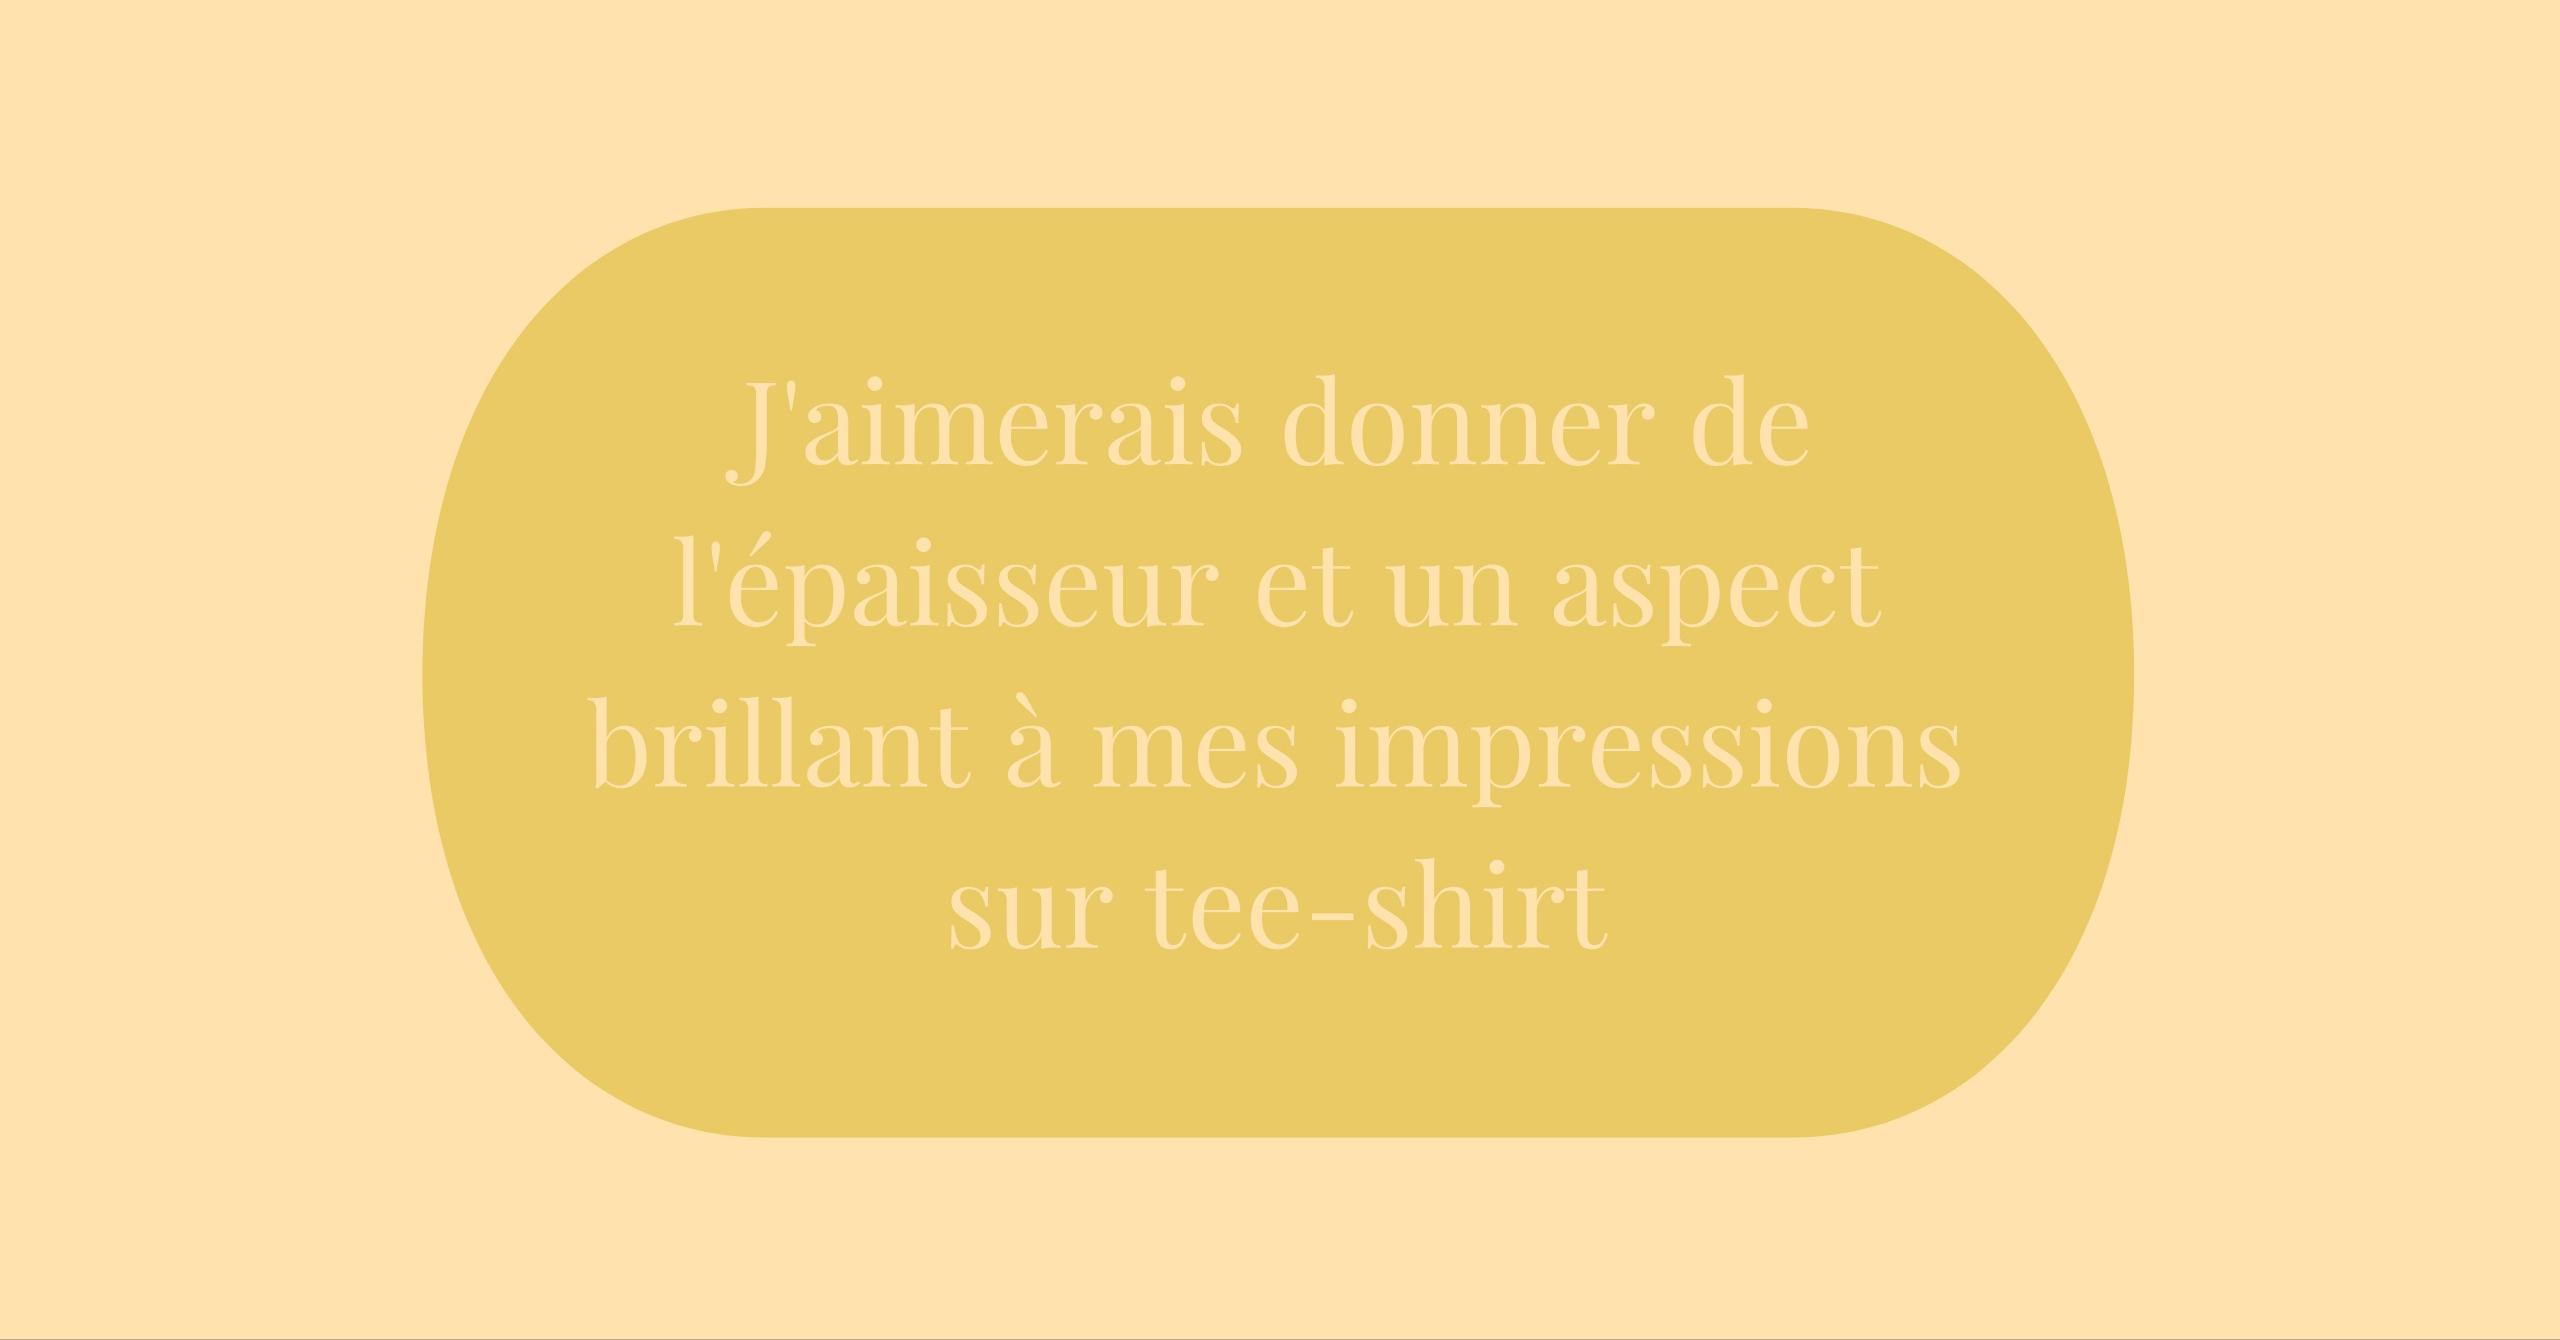 aspect brillant impressions sur tee-shirt